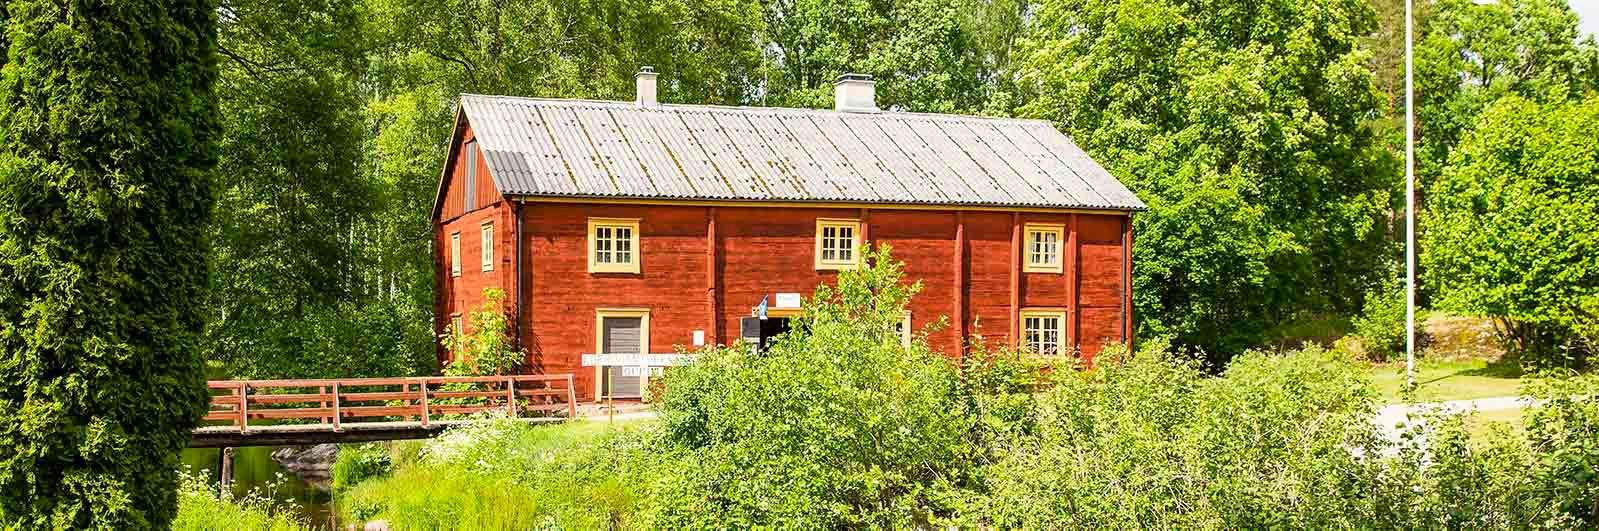 Röd stuga i Korrö hantverksby